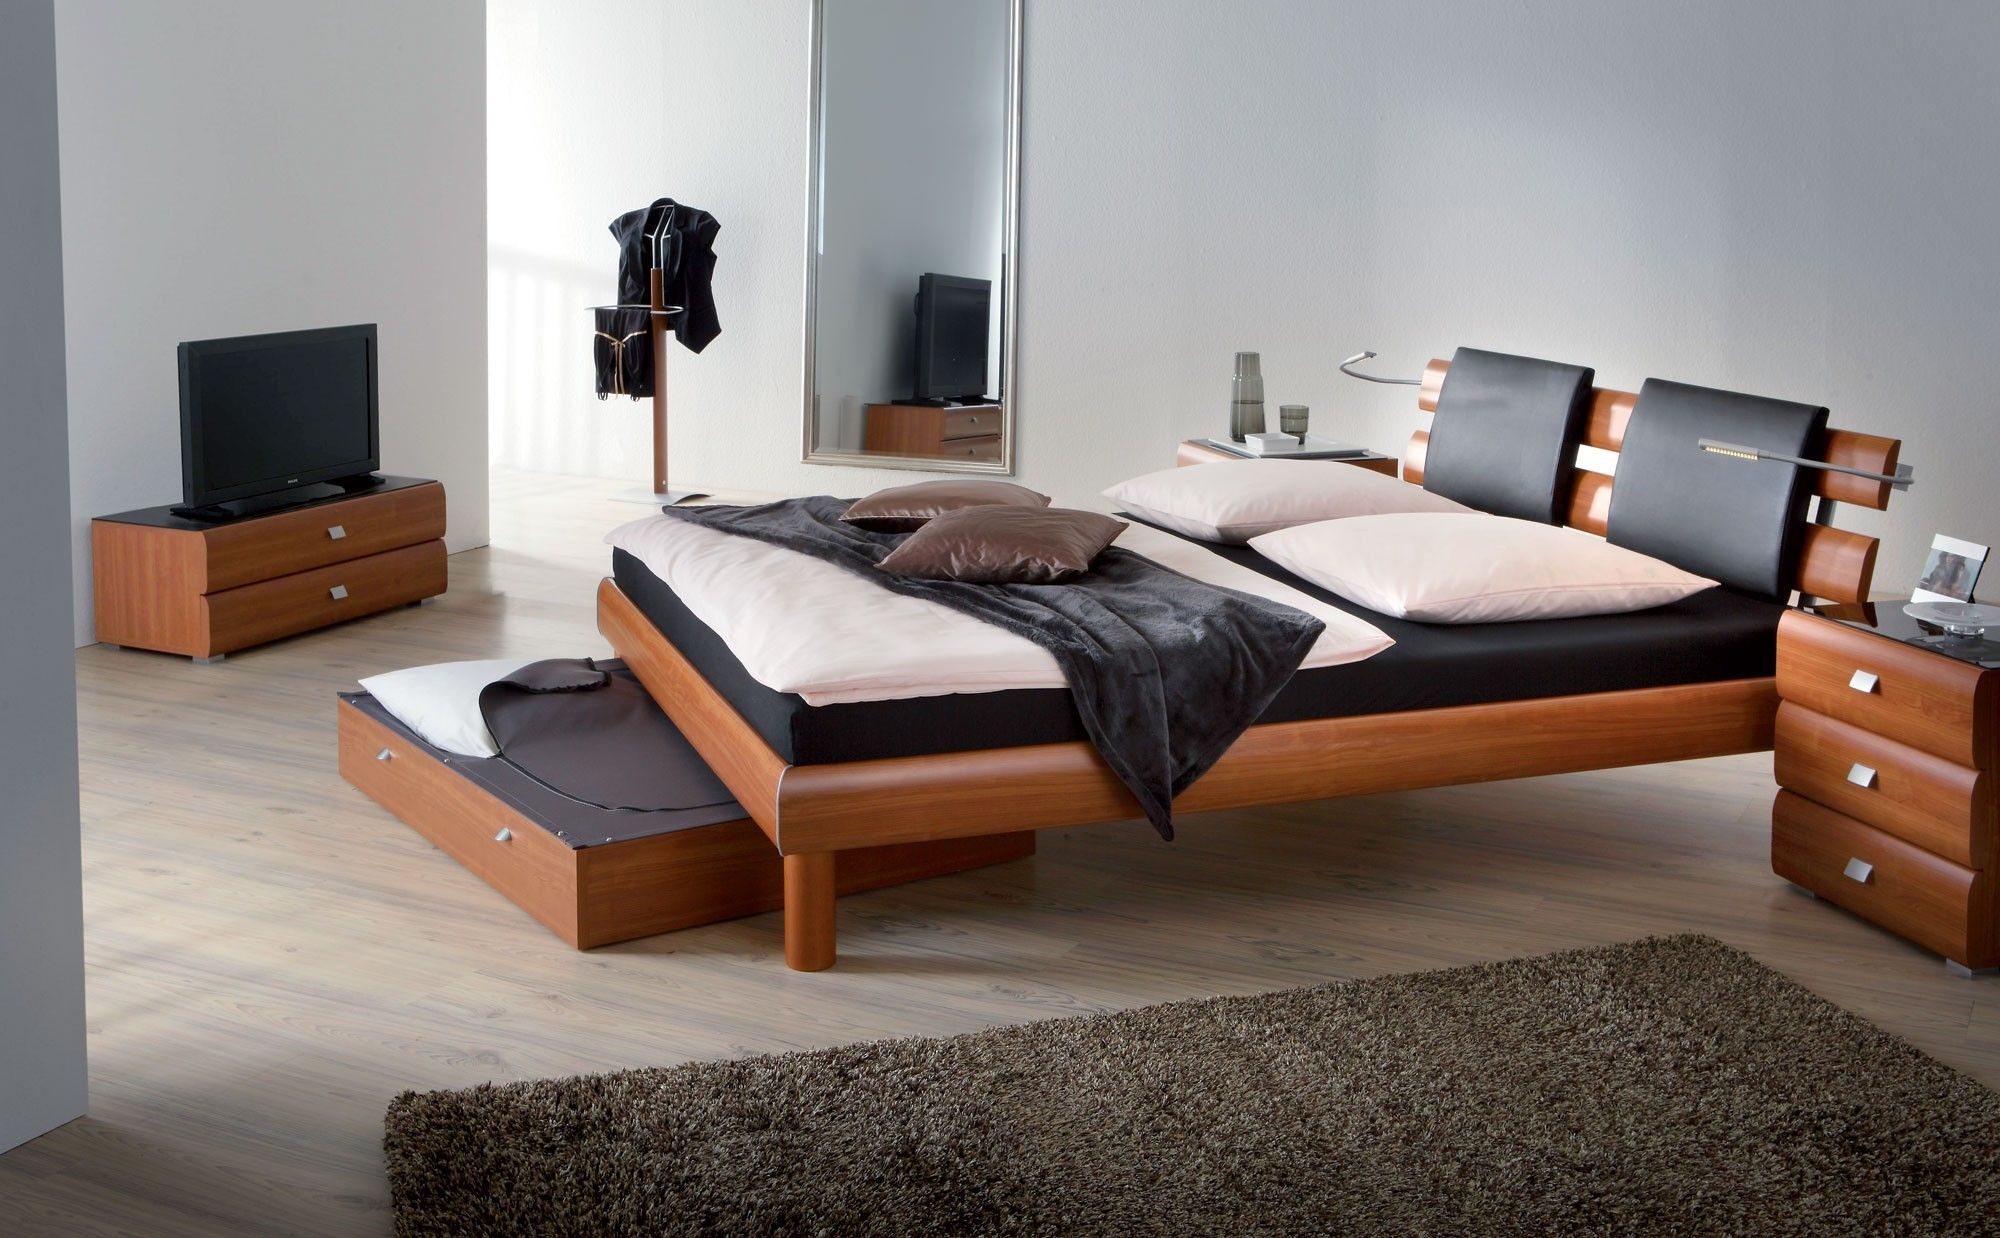 Hasena Softline Stomp Panele Suny Bed Head2Bed UK. £